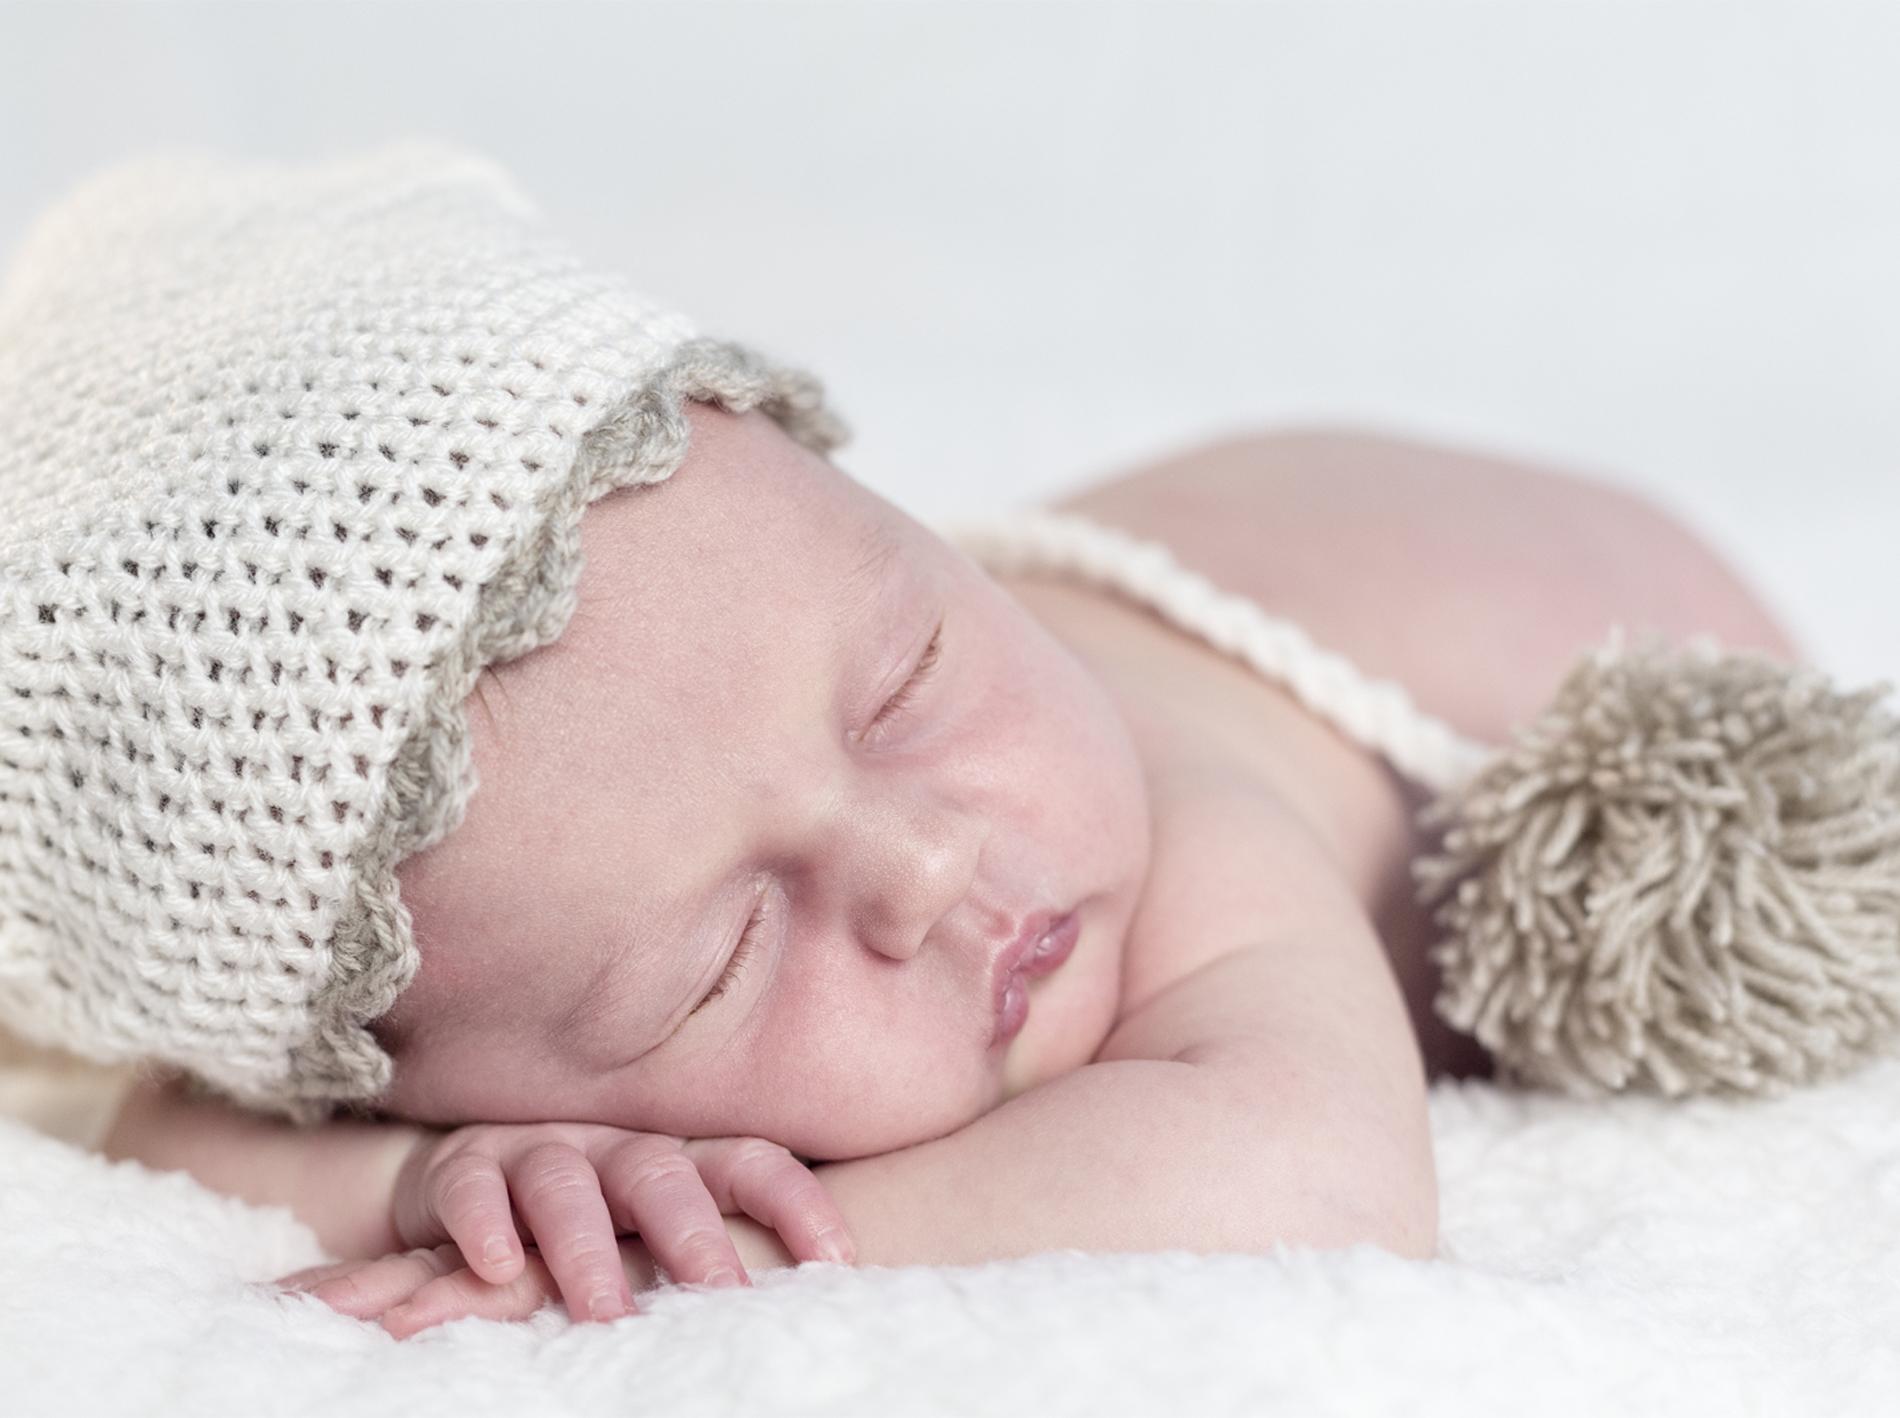 newbornfotografie-ina vrinssen fotografie